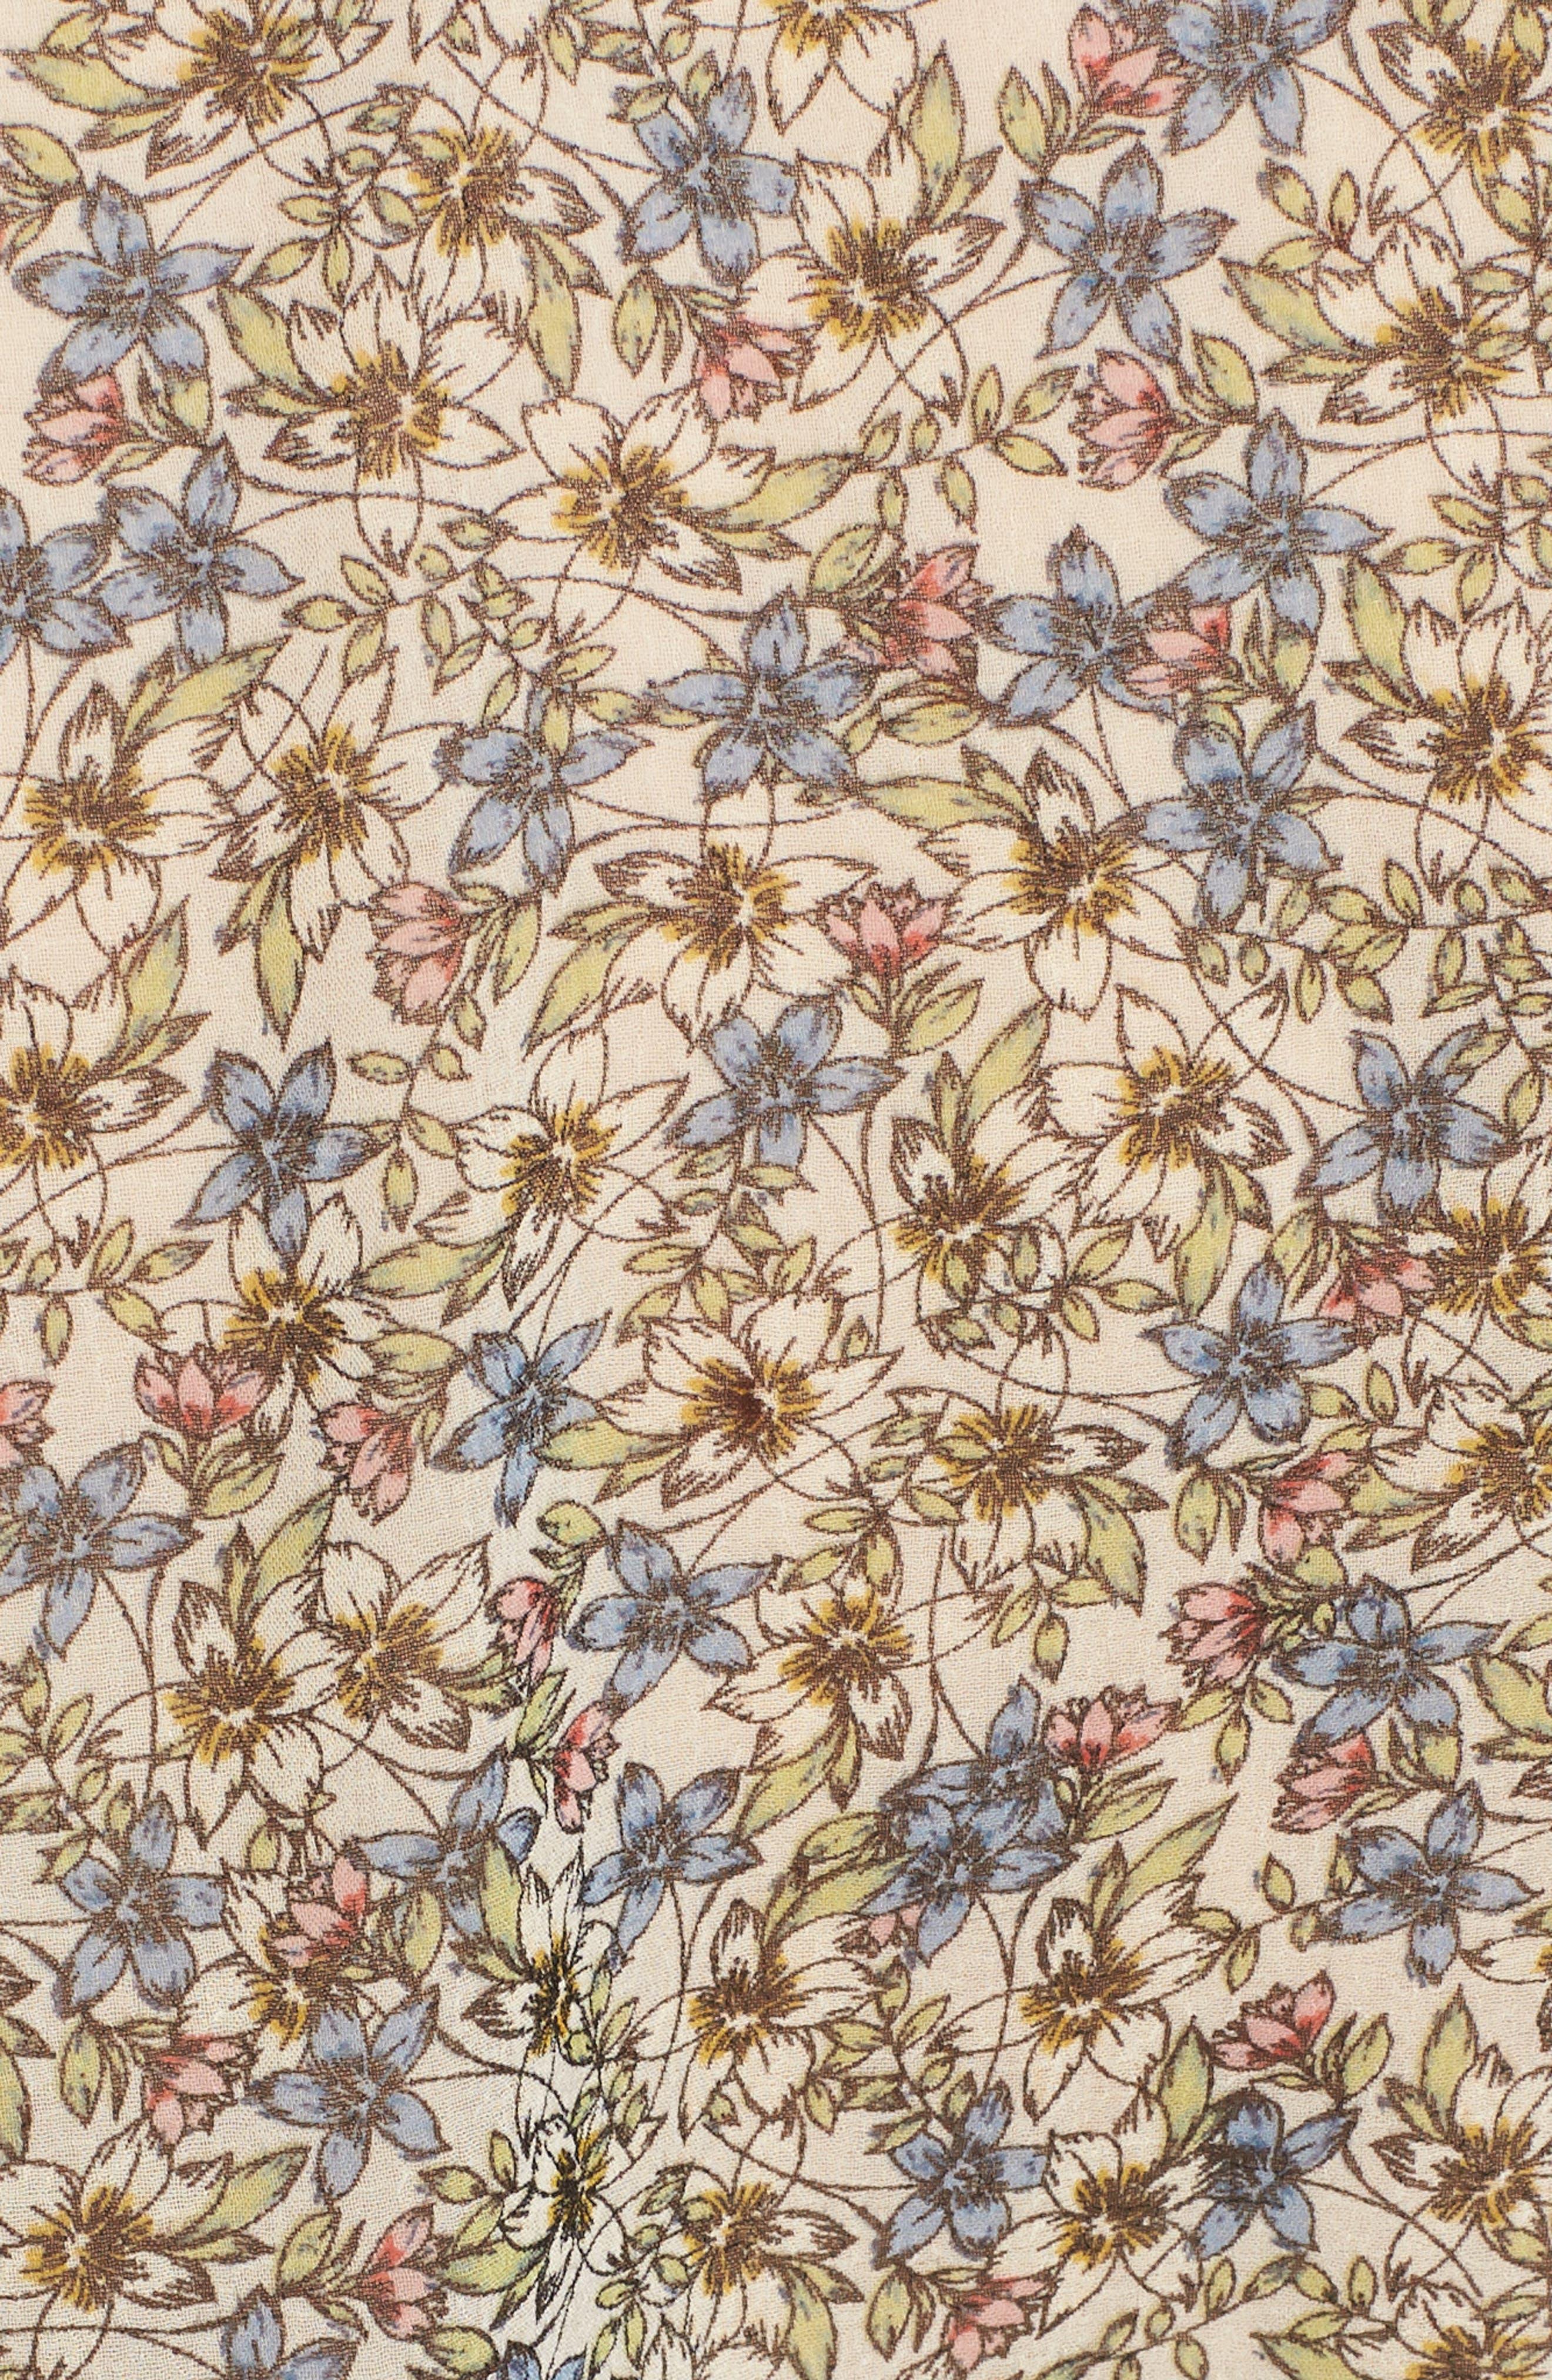 Zilla Floral Blouse,                             Alternate thumbnail 6, color,                             OATMEAL